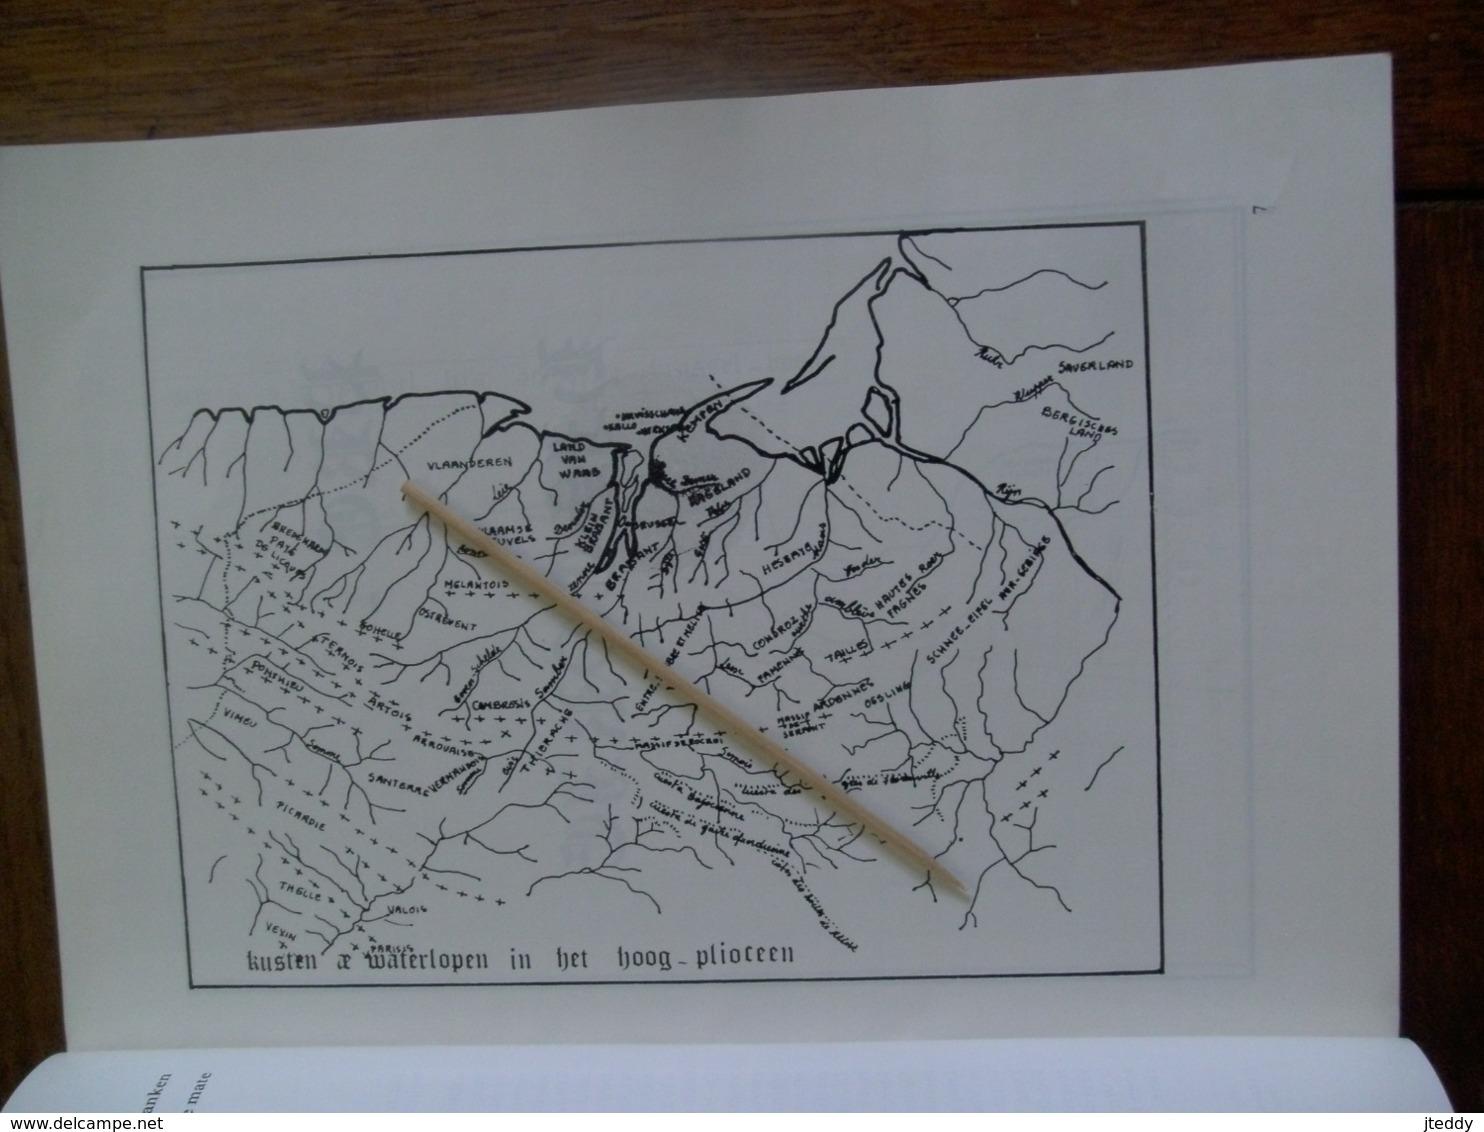 Boek   RIPULA  THAMERA  _- Rupel-- Demer - Streek  -- Klein-Brabant & De Durme--Schelde - Hoek 1981 Gesigneerd - Archéologie